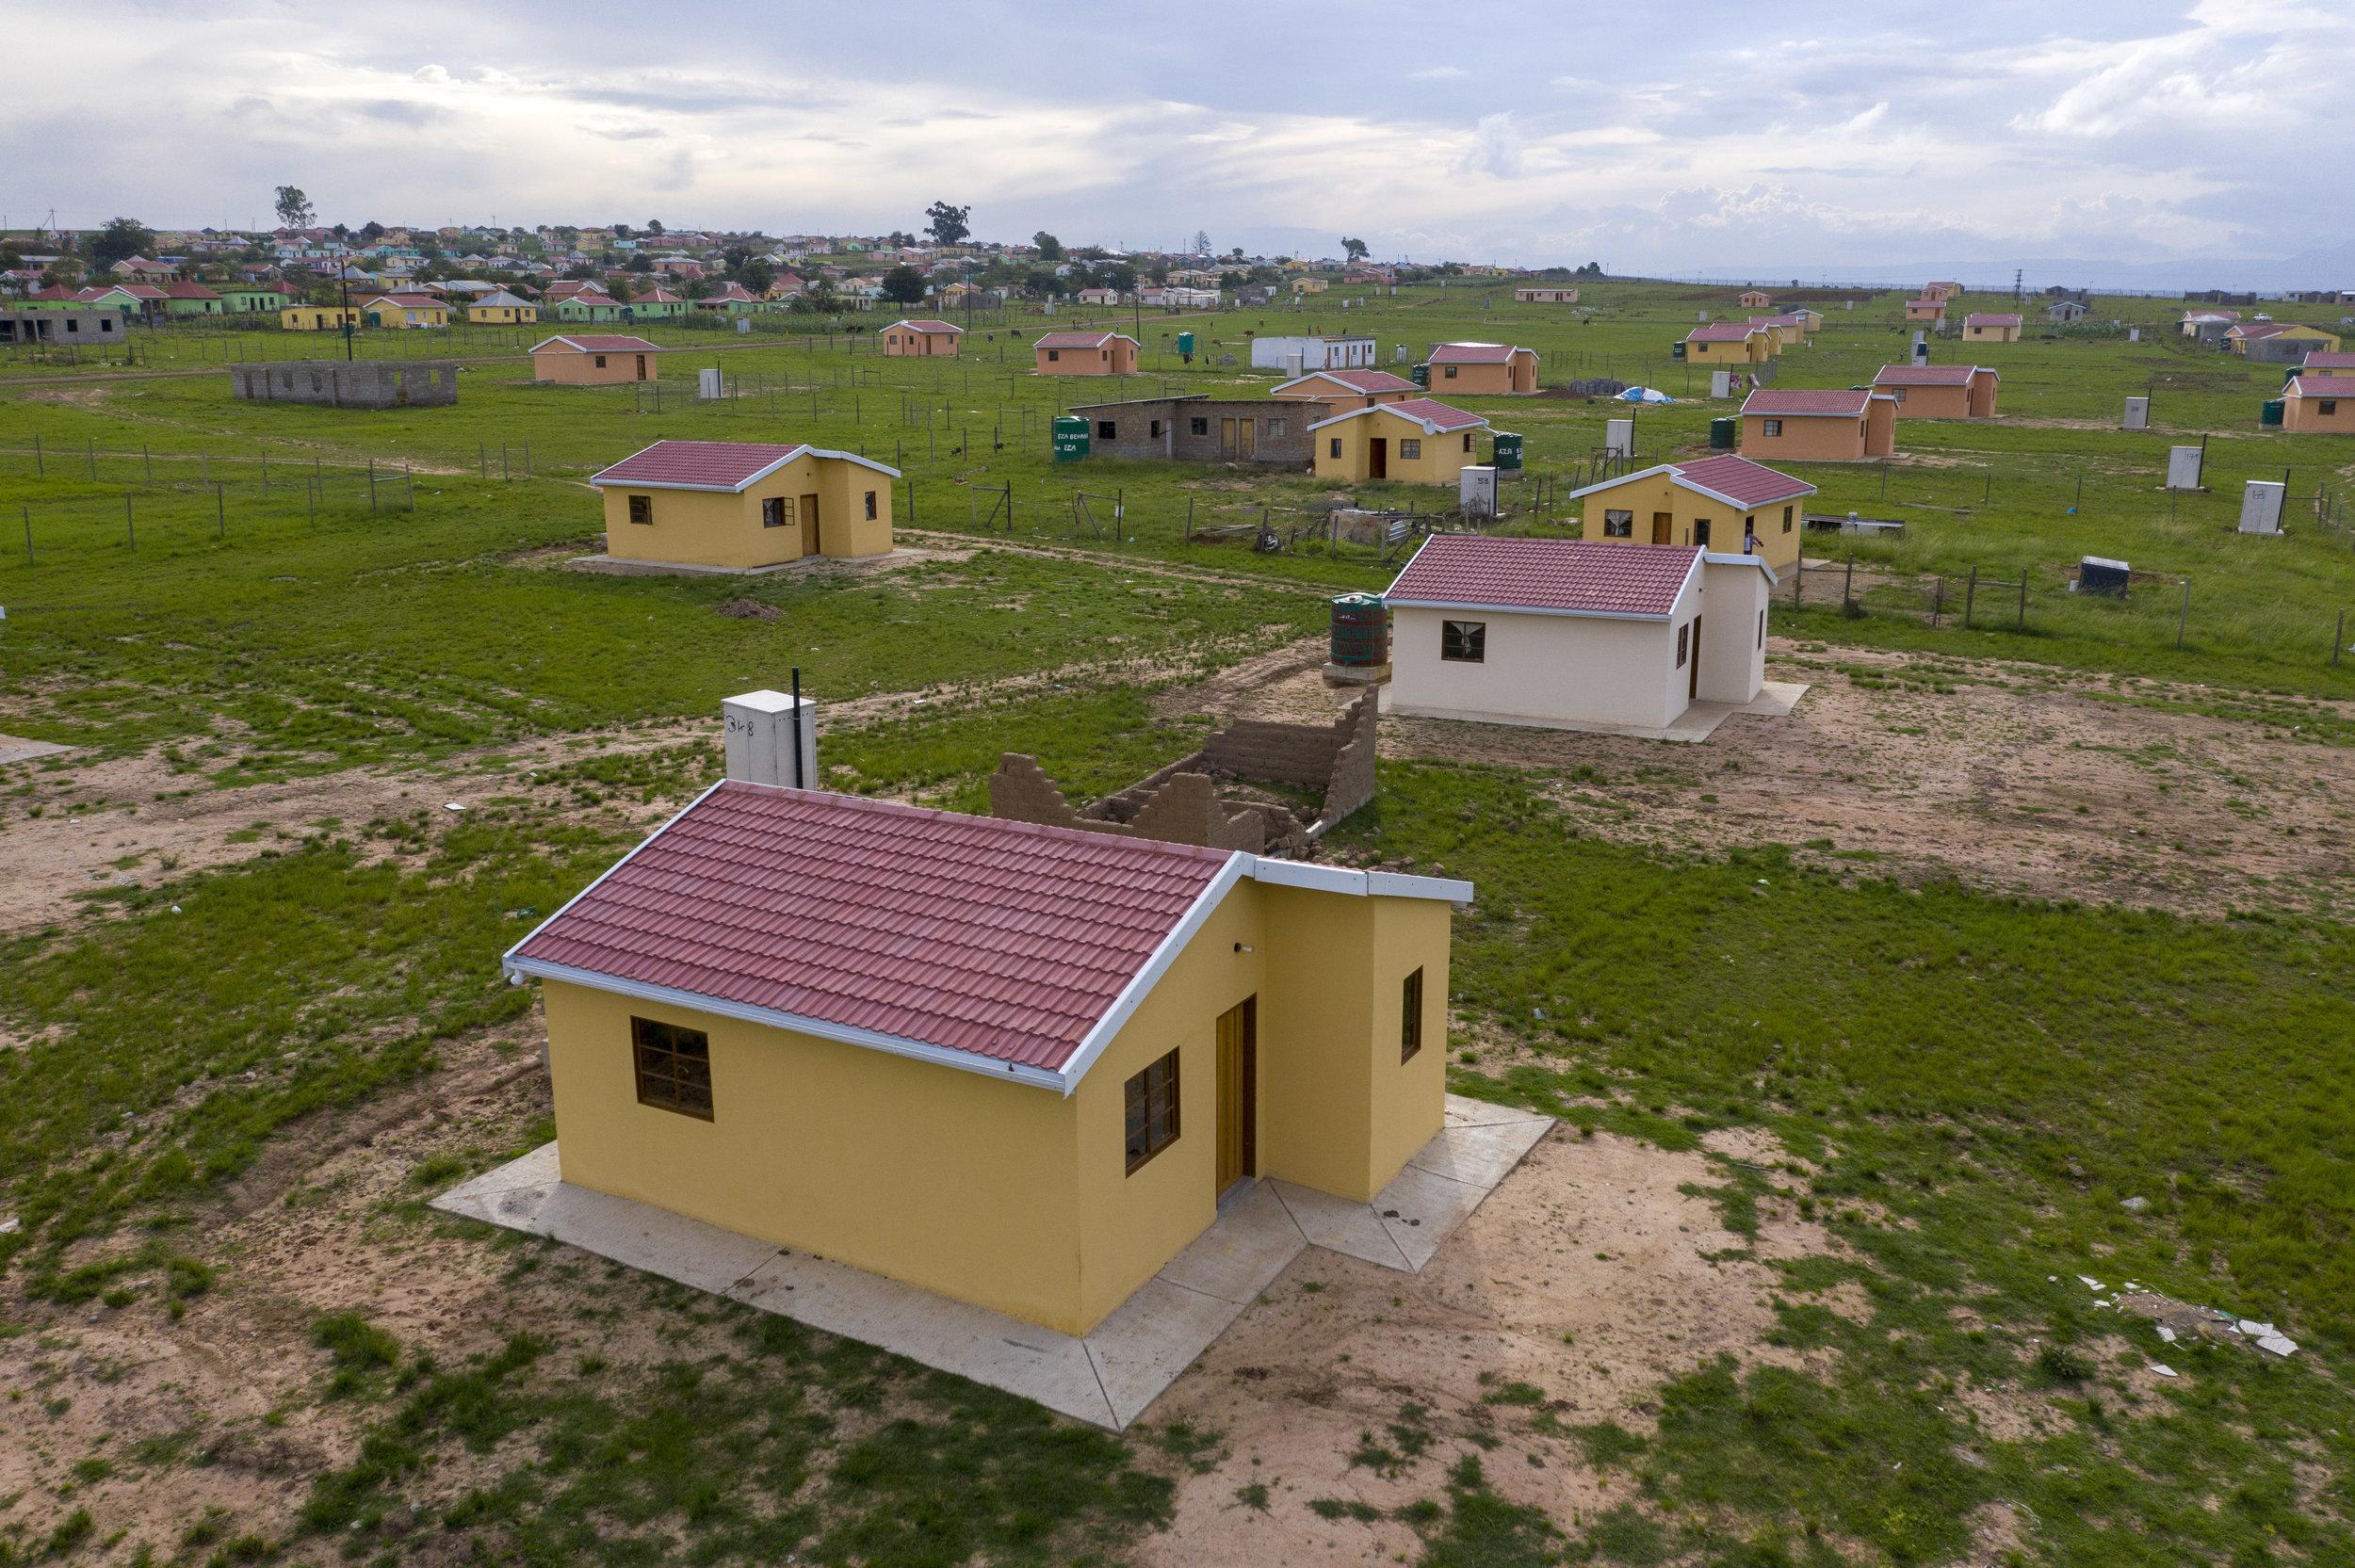 Fairfield Housing Project